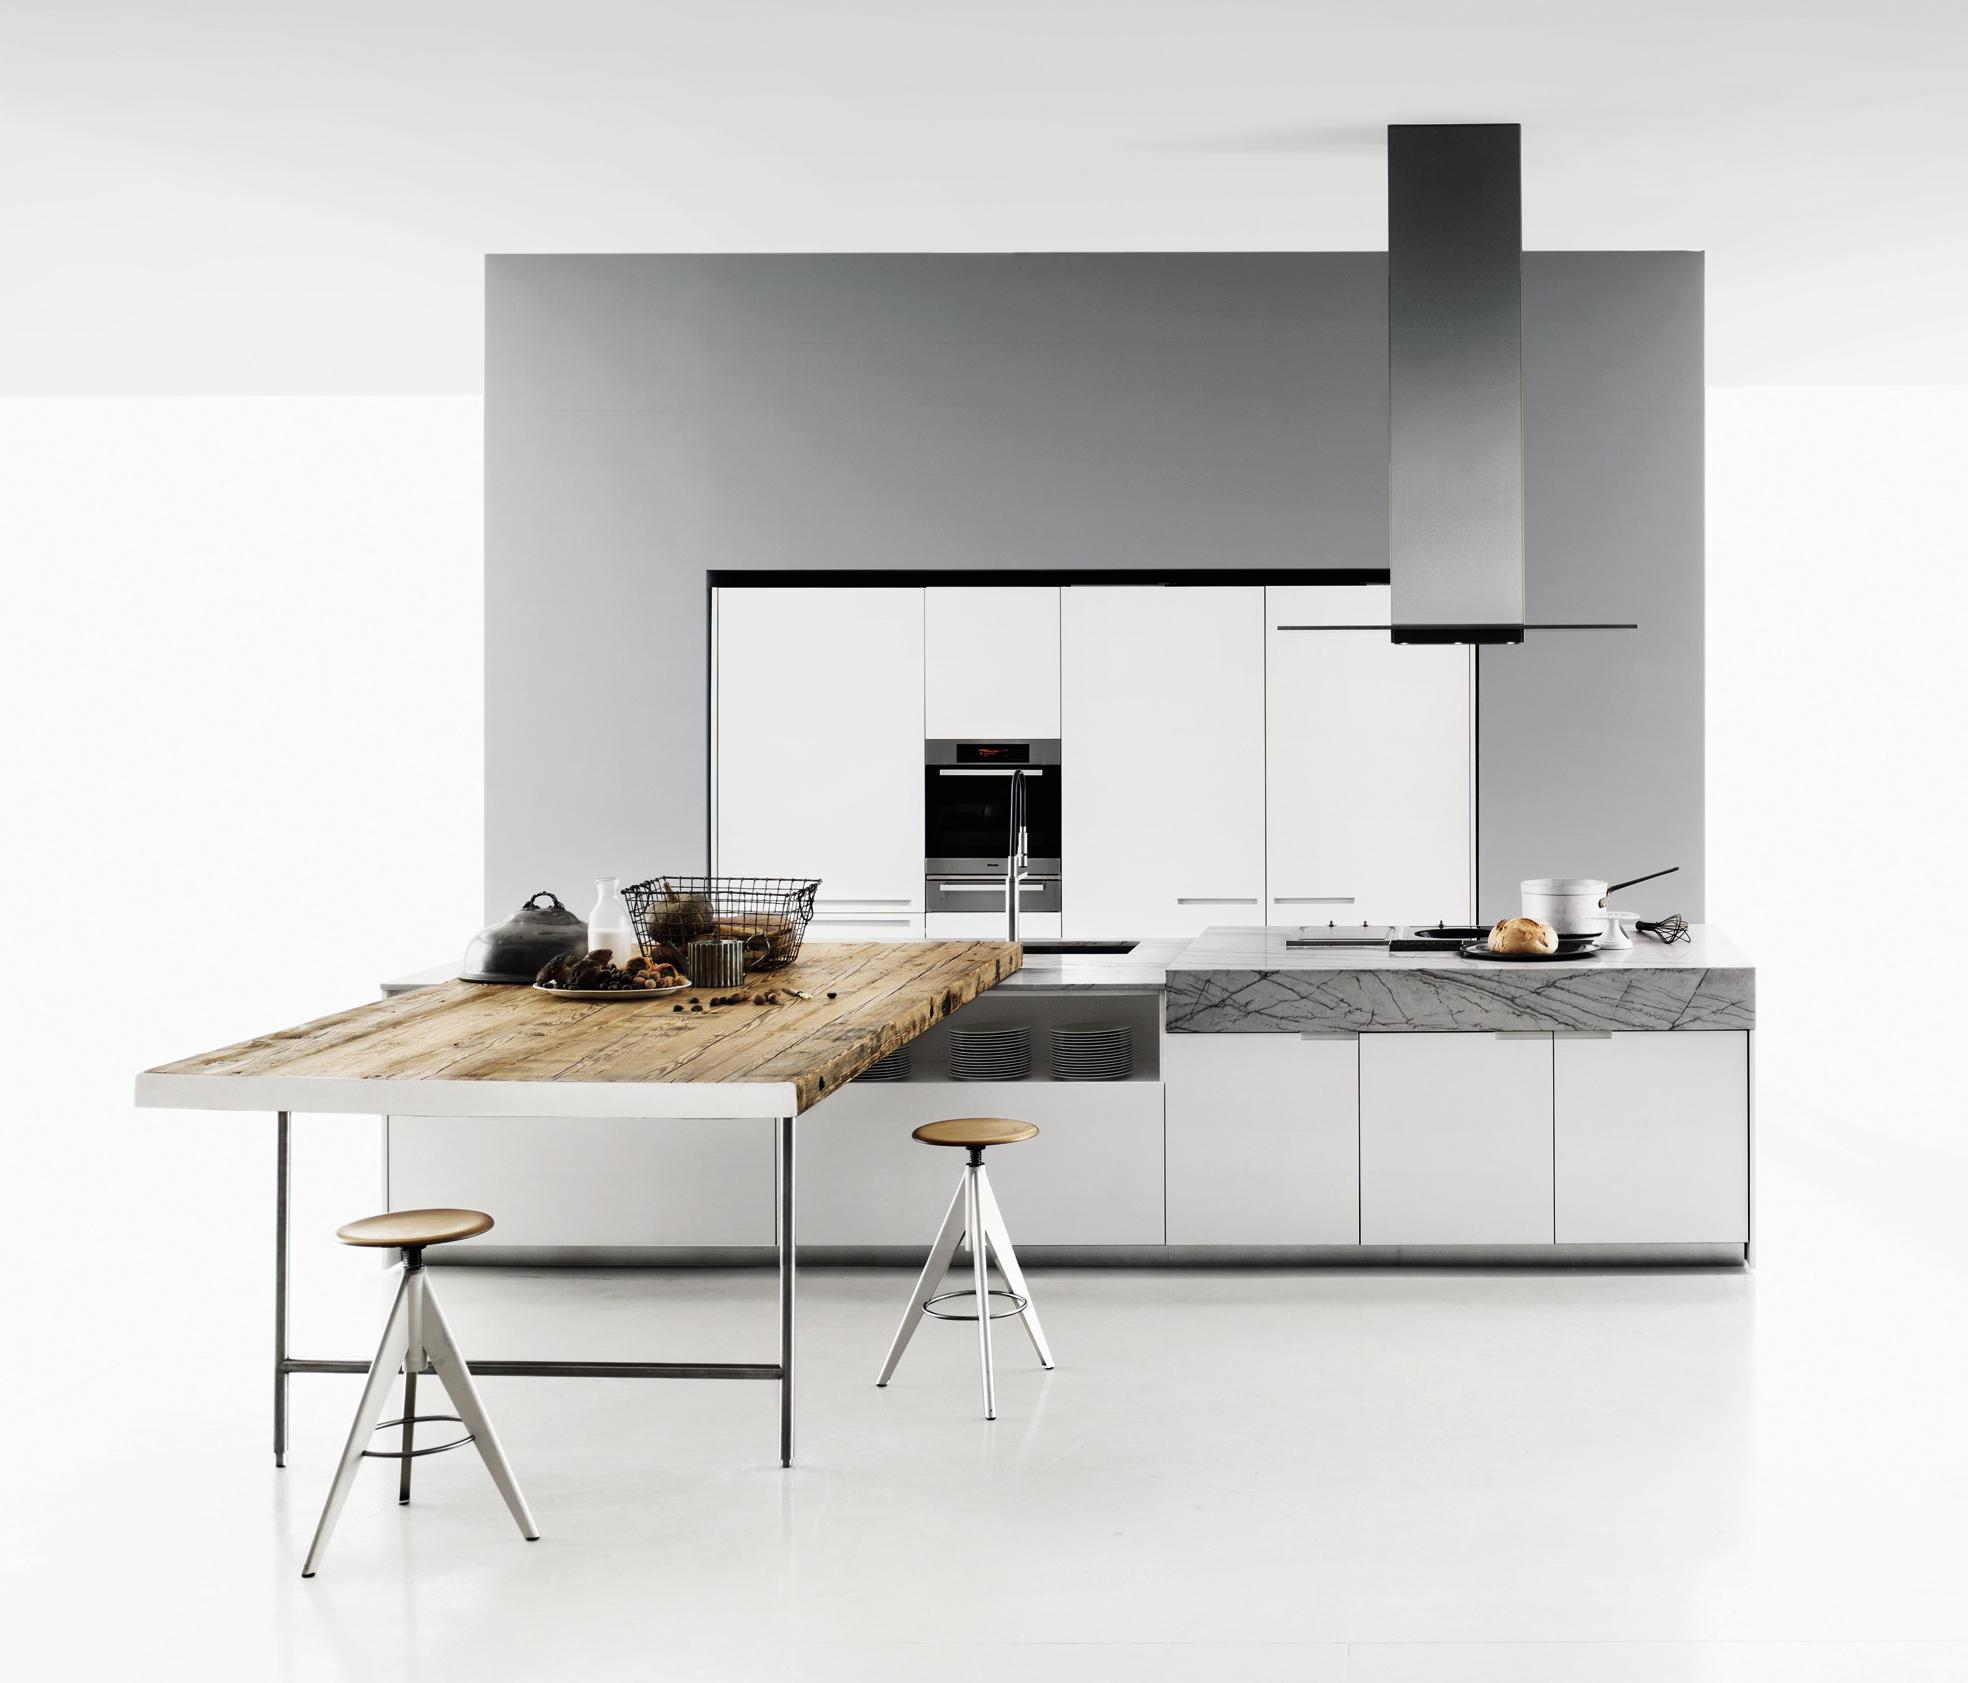 Stunning boffi cucine catalogo contemporary ideas for Boffi cucine catalogo